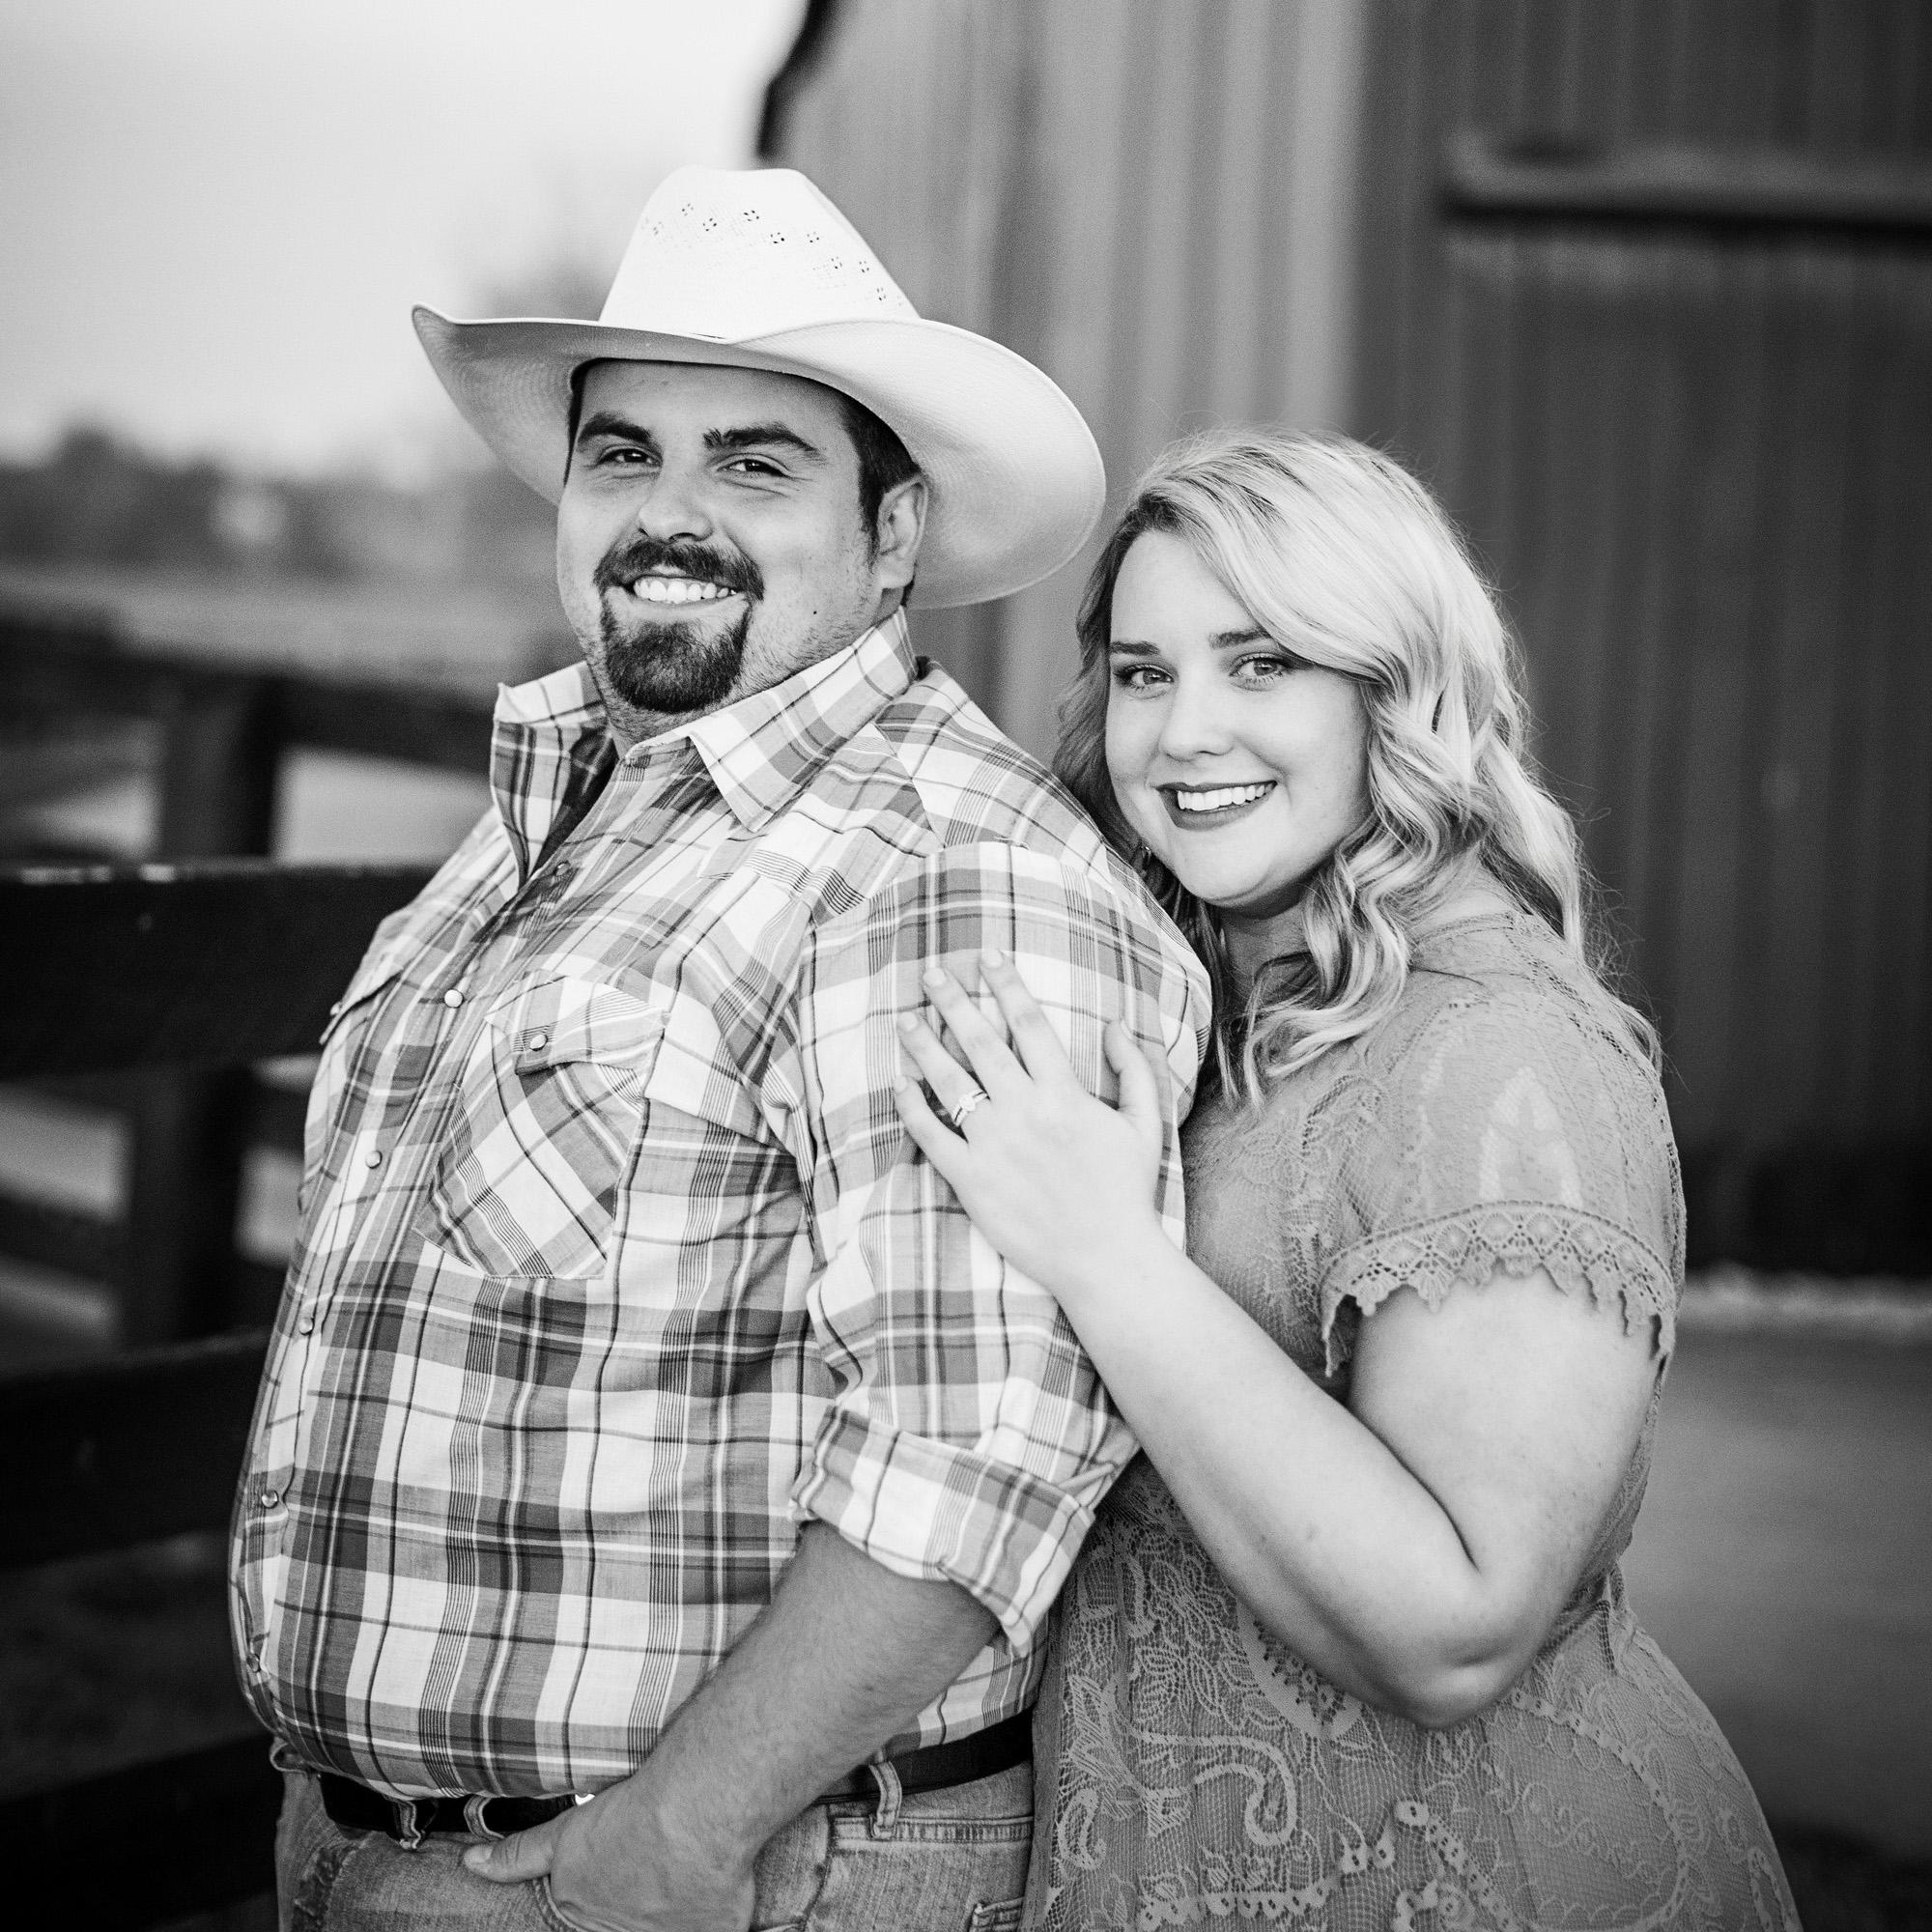 Seriously_Sabrina_Photography_Lexington_Kentucky_Sunset_Farm_Engagement_Cody_Sara_23.jpg